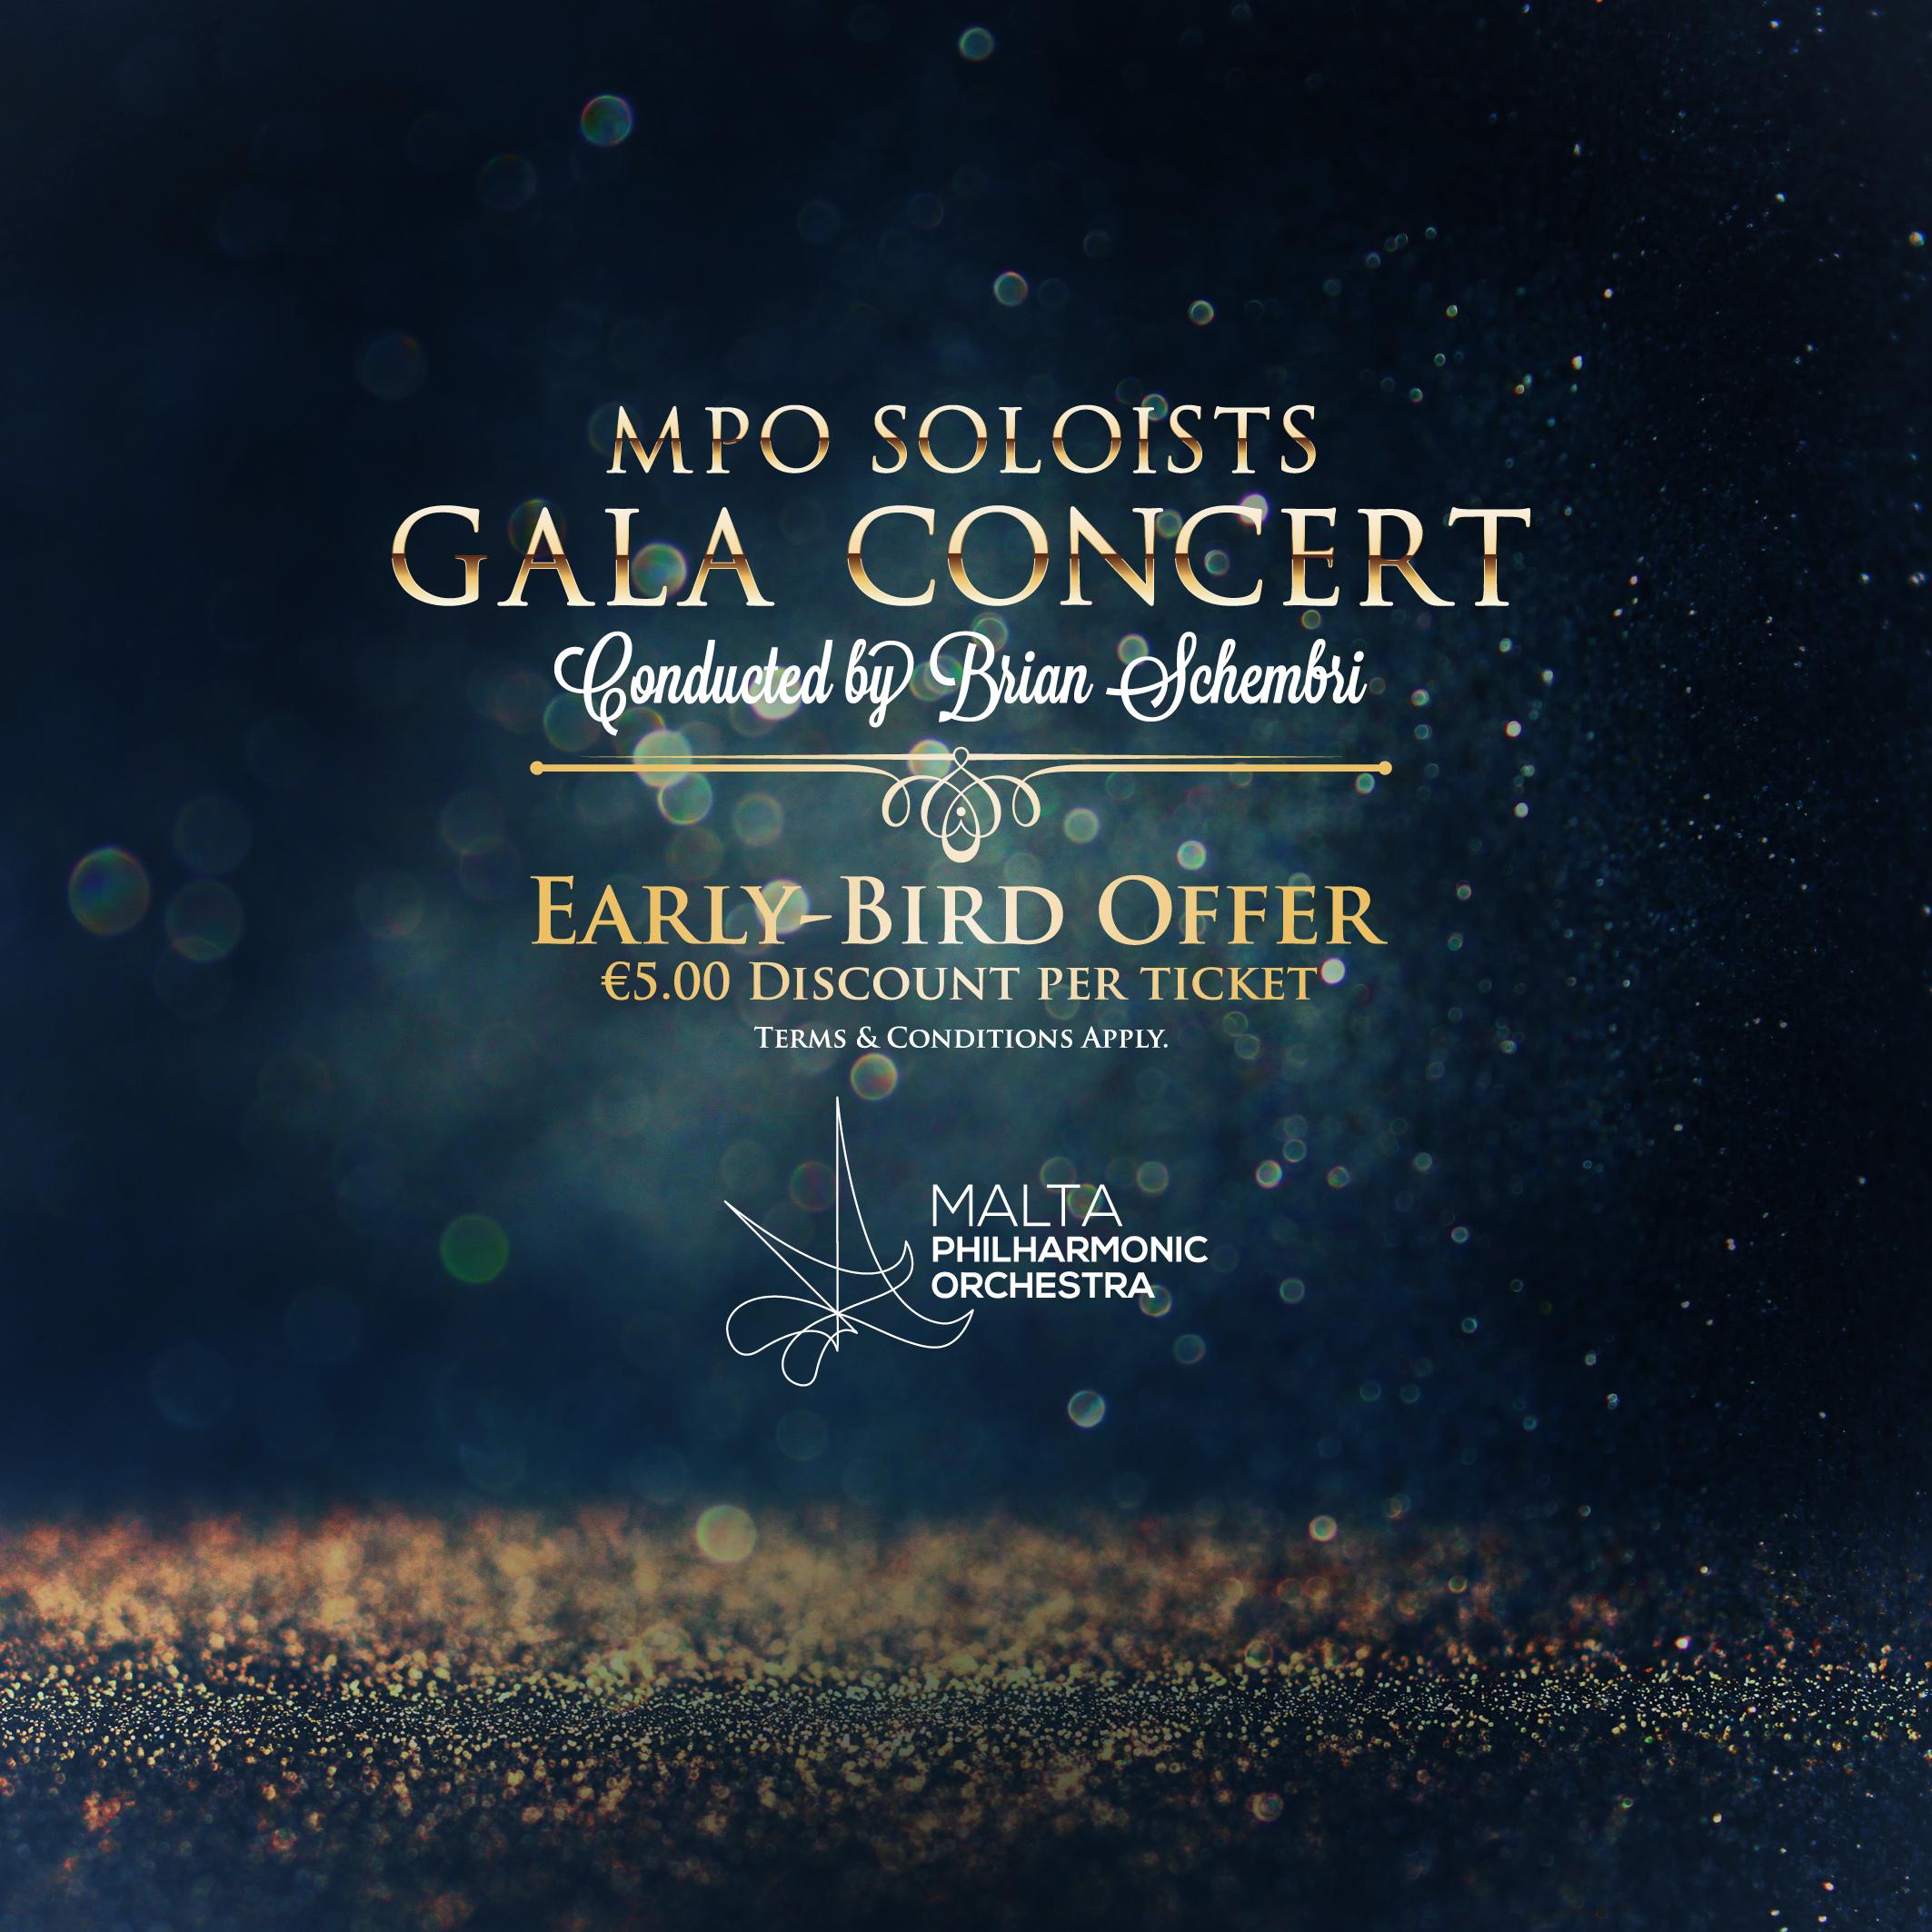 MPO Soloists Gala Concert